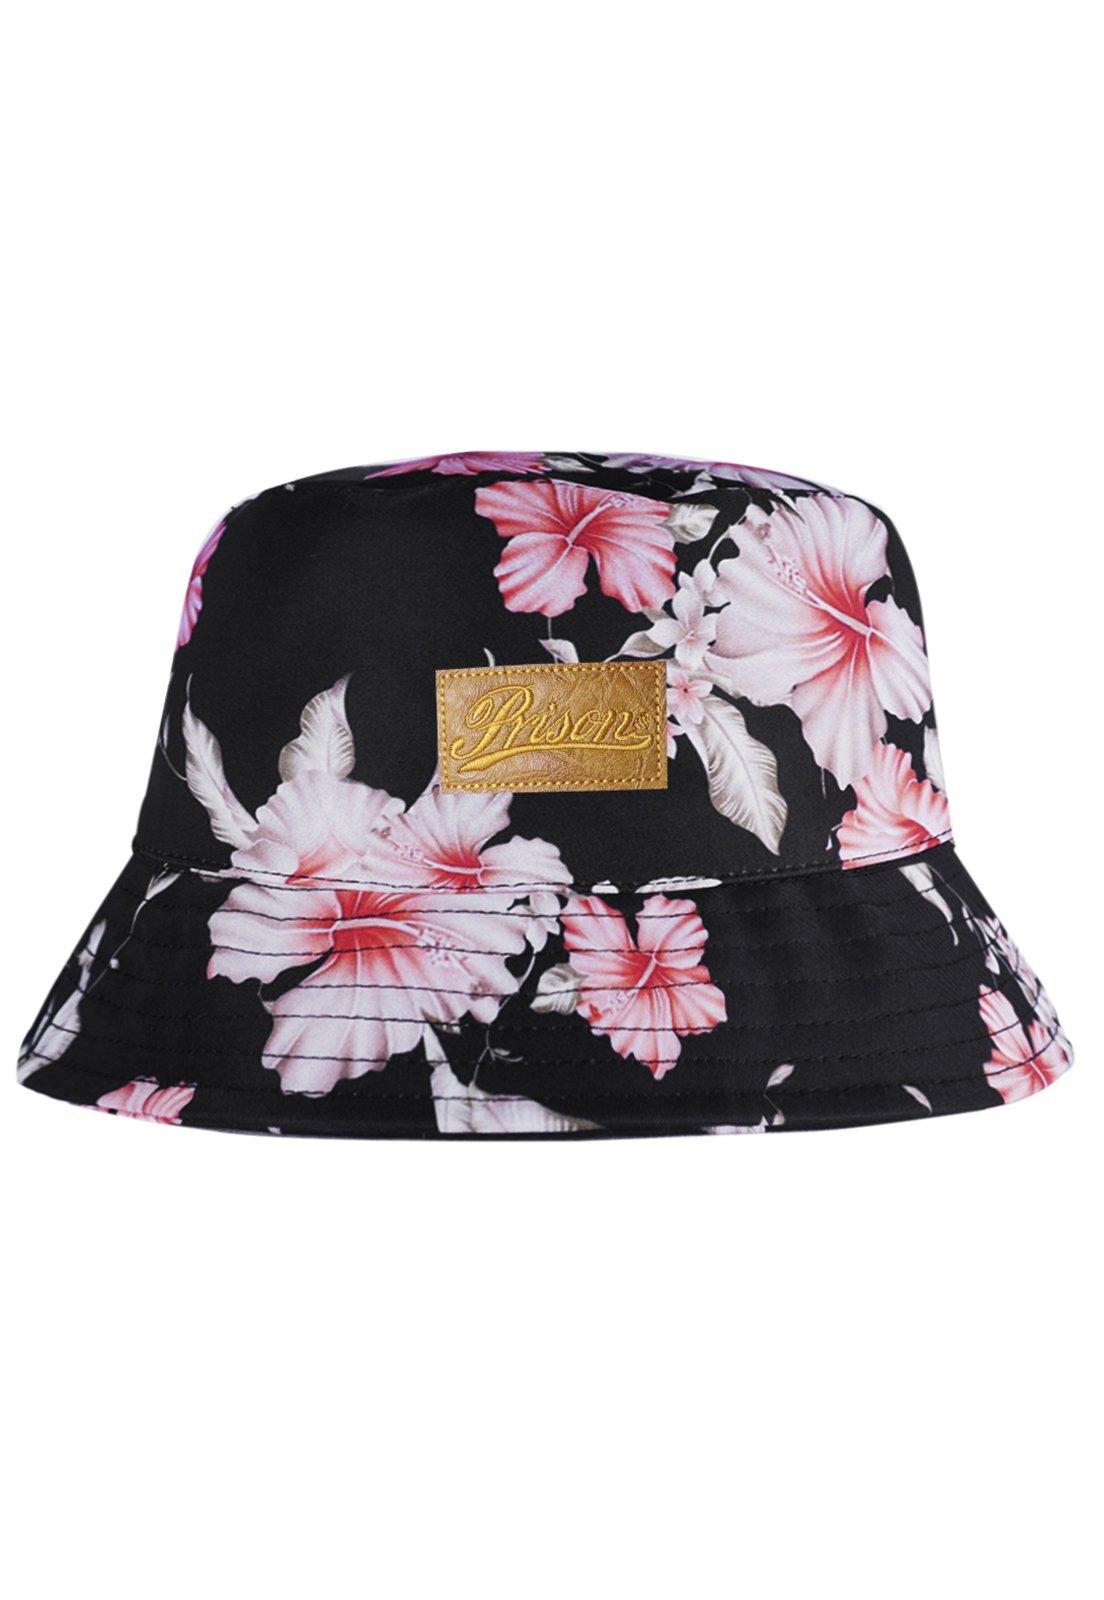 Bucket Hat Prison Floral Swag Preto - Compre Agora  473180d5f045